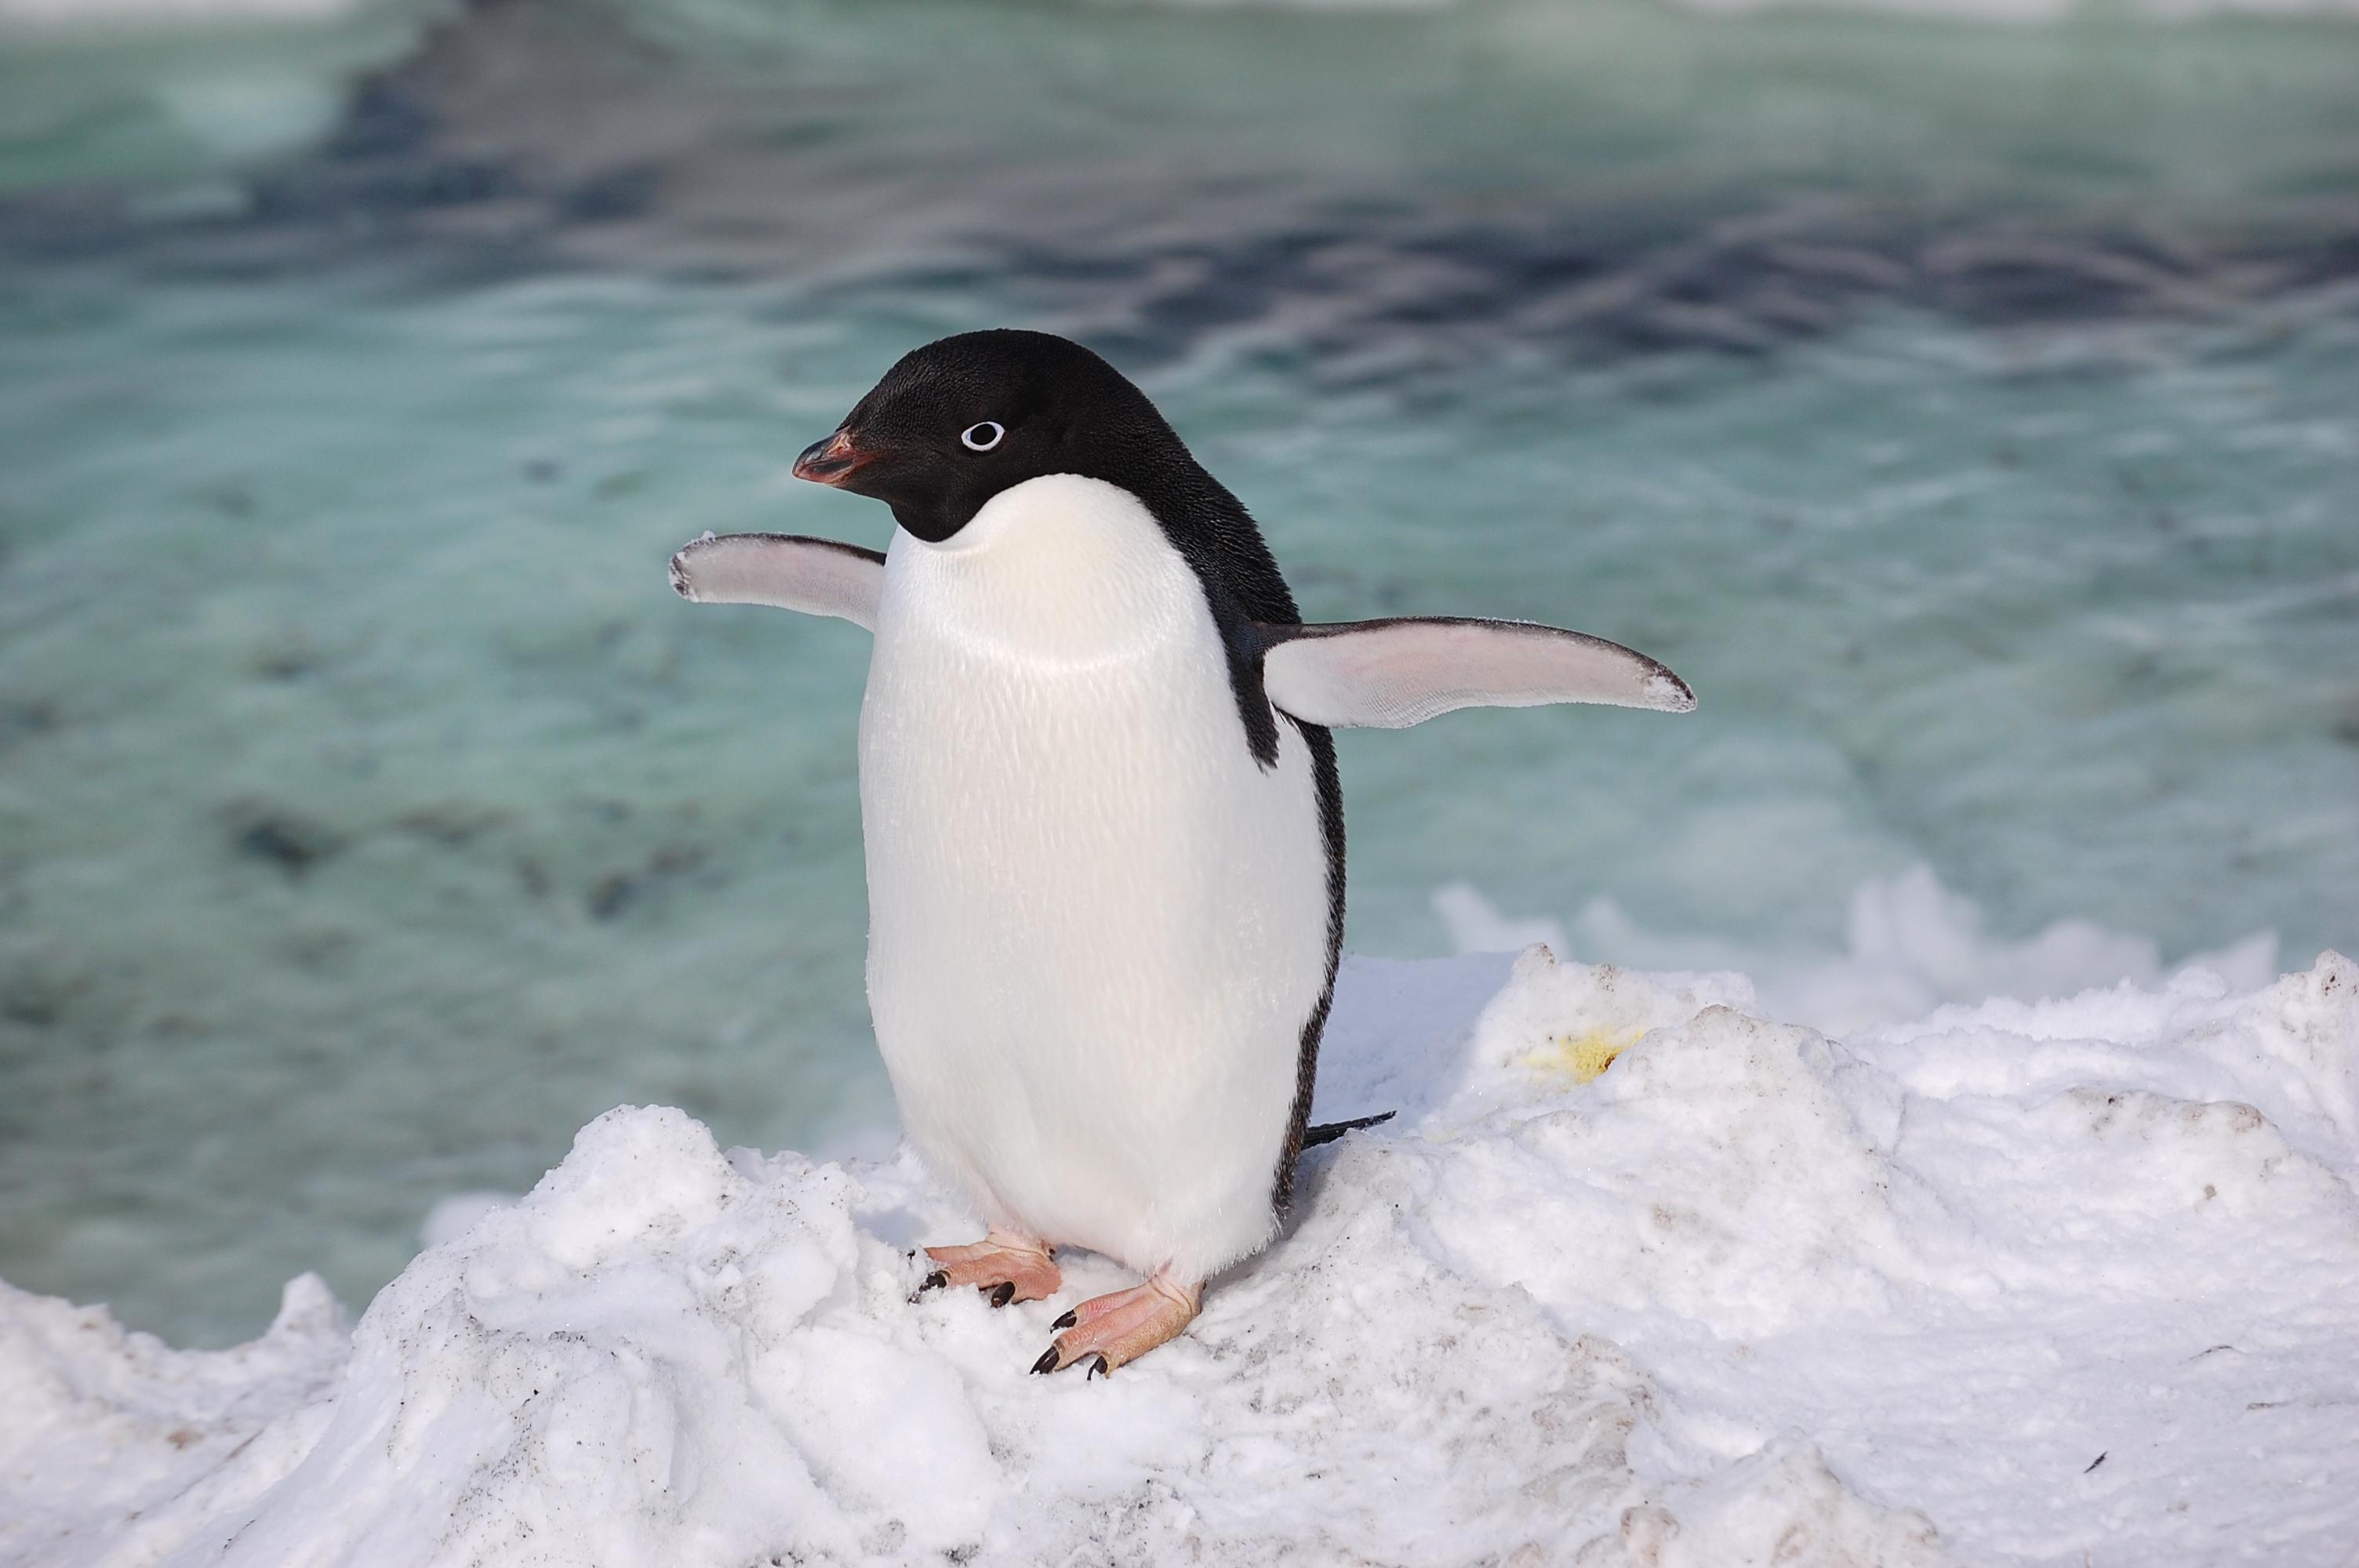 Penguin contracting